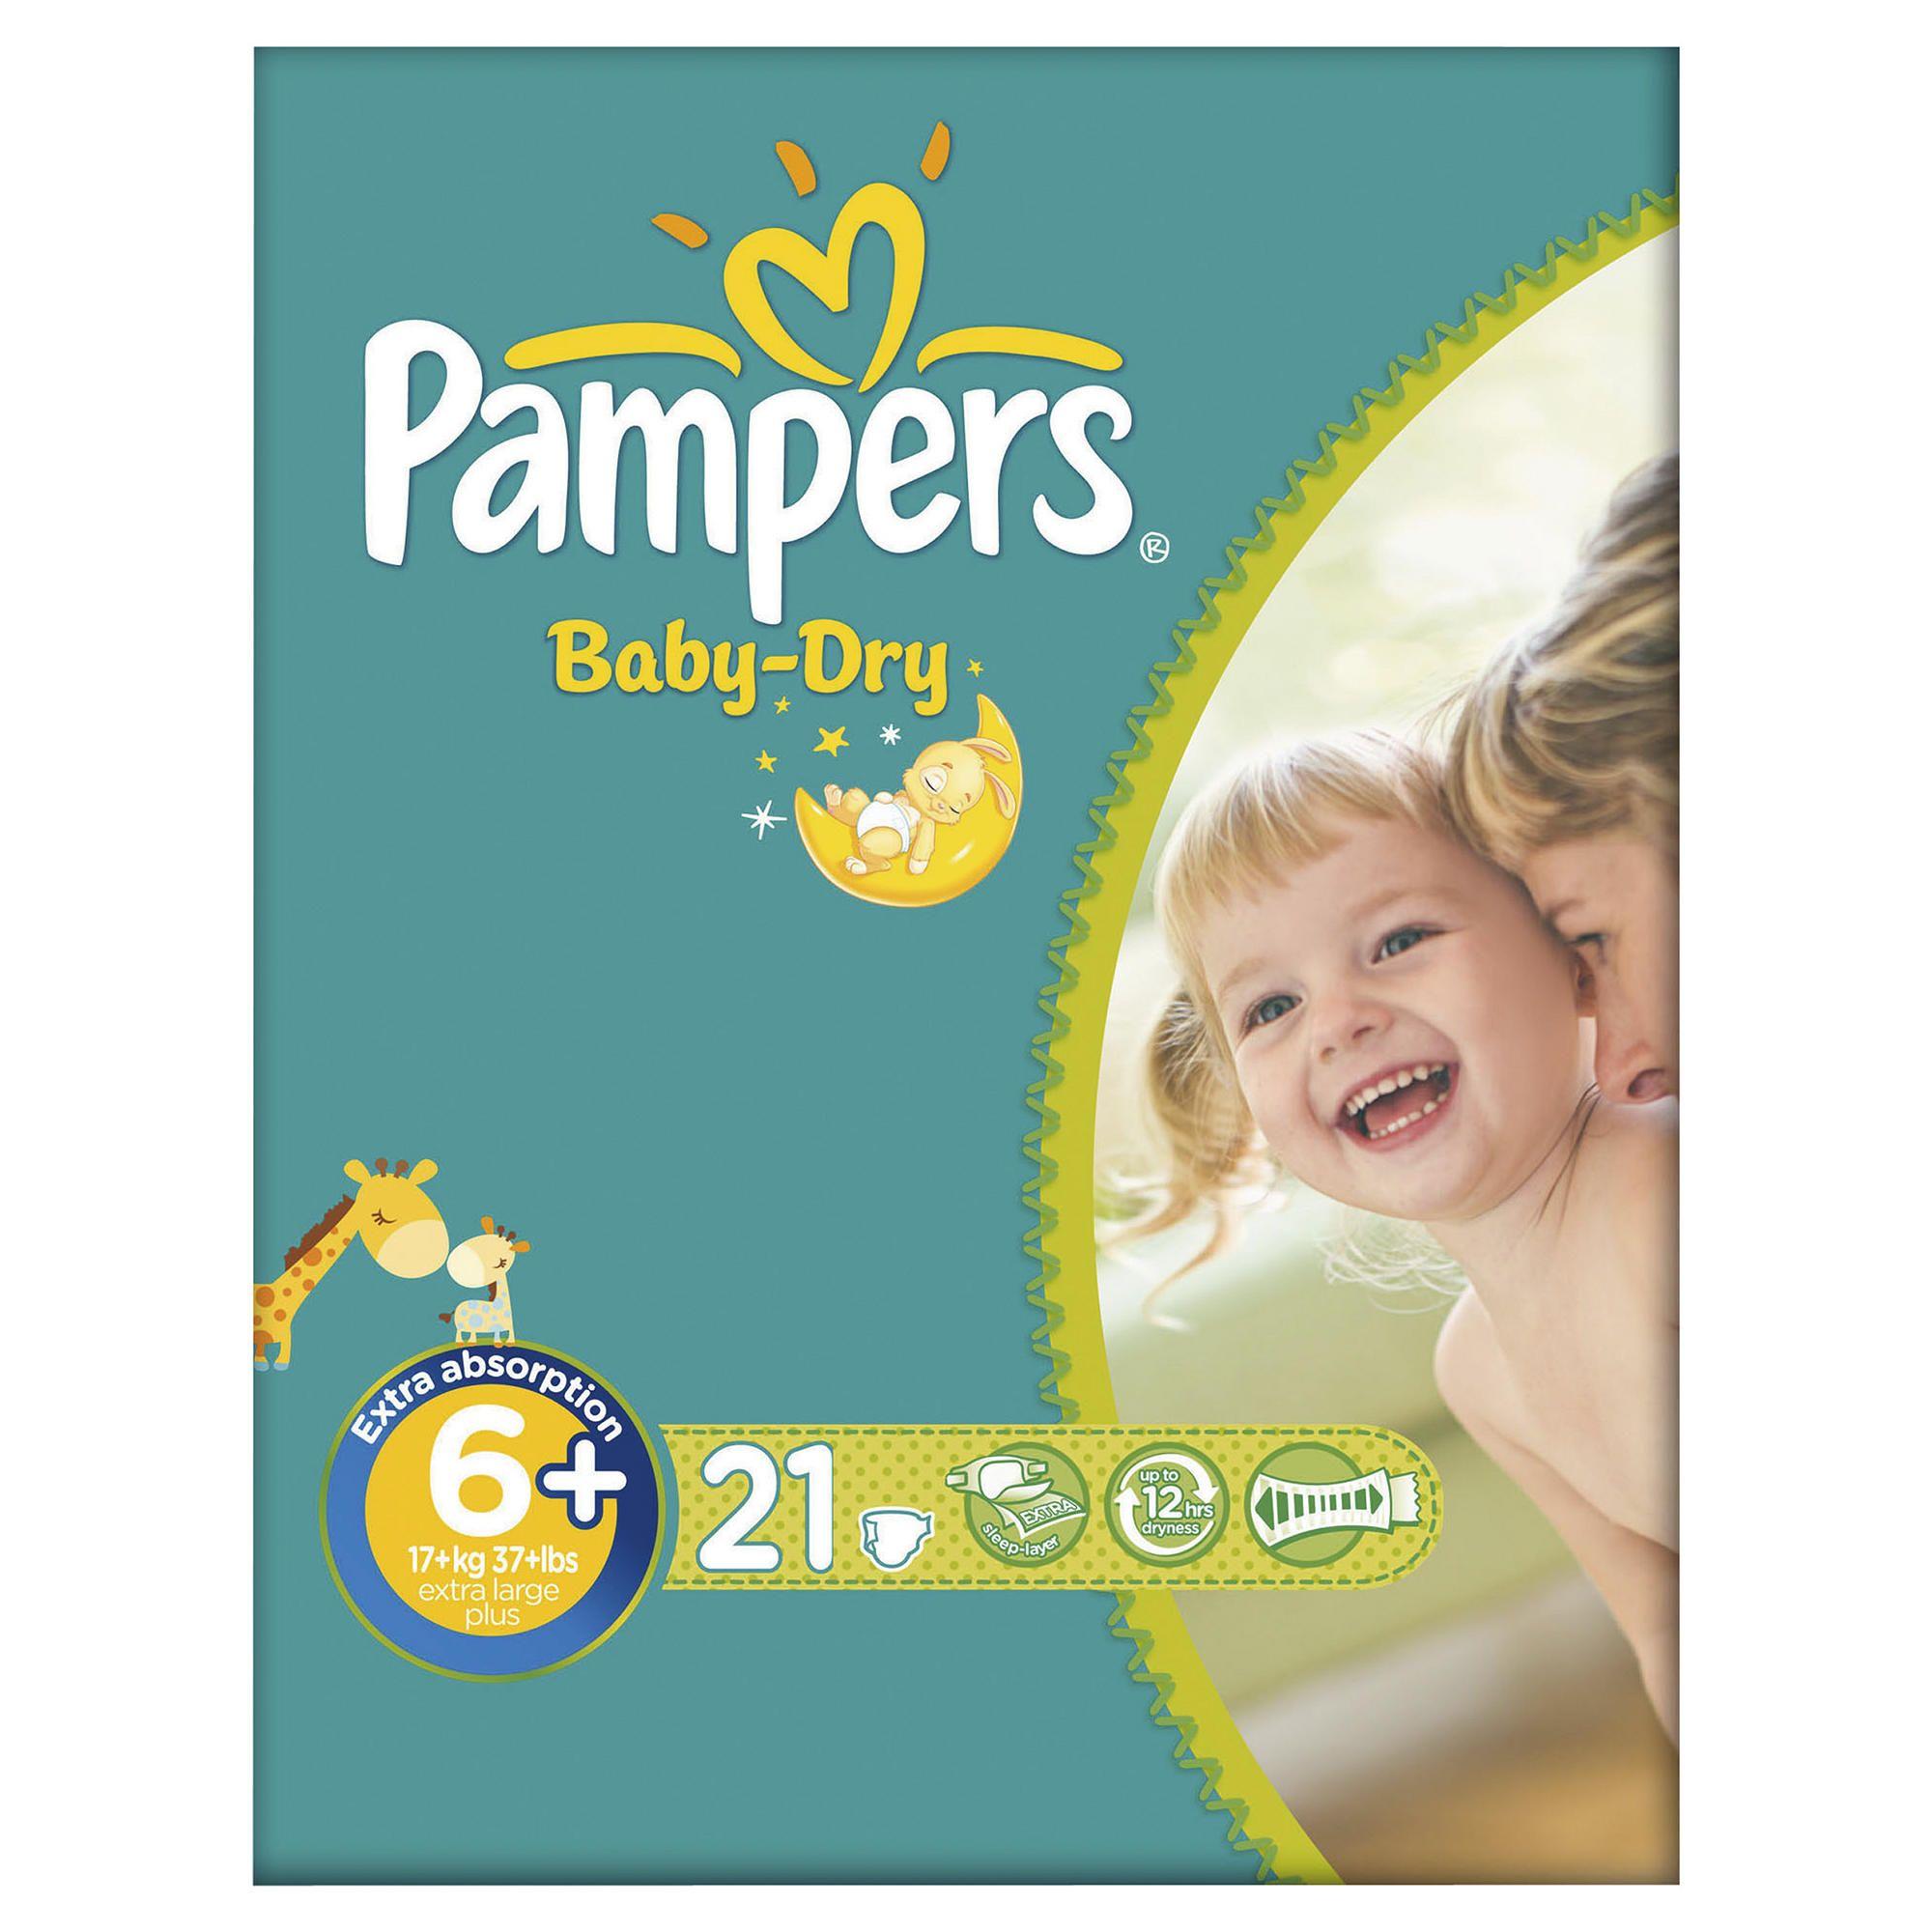 Baby Prams